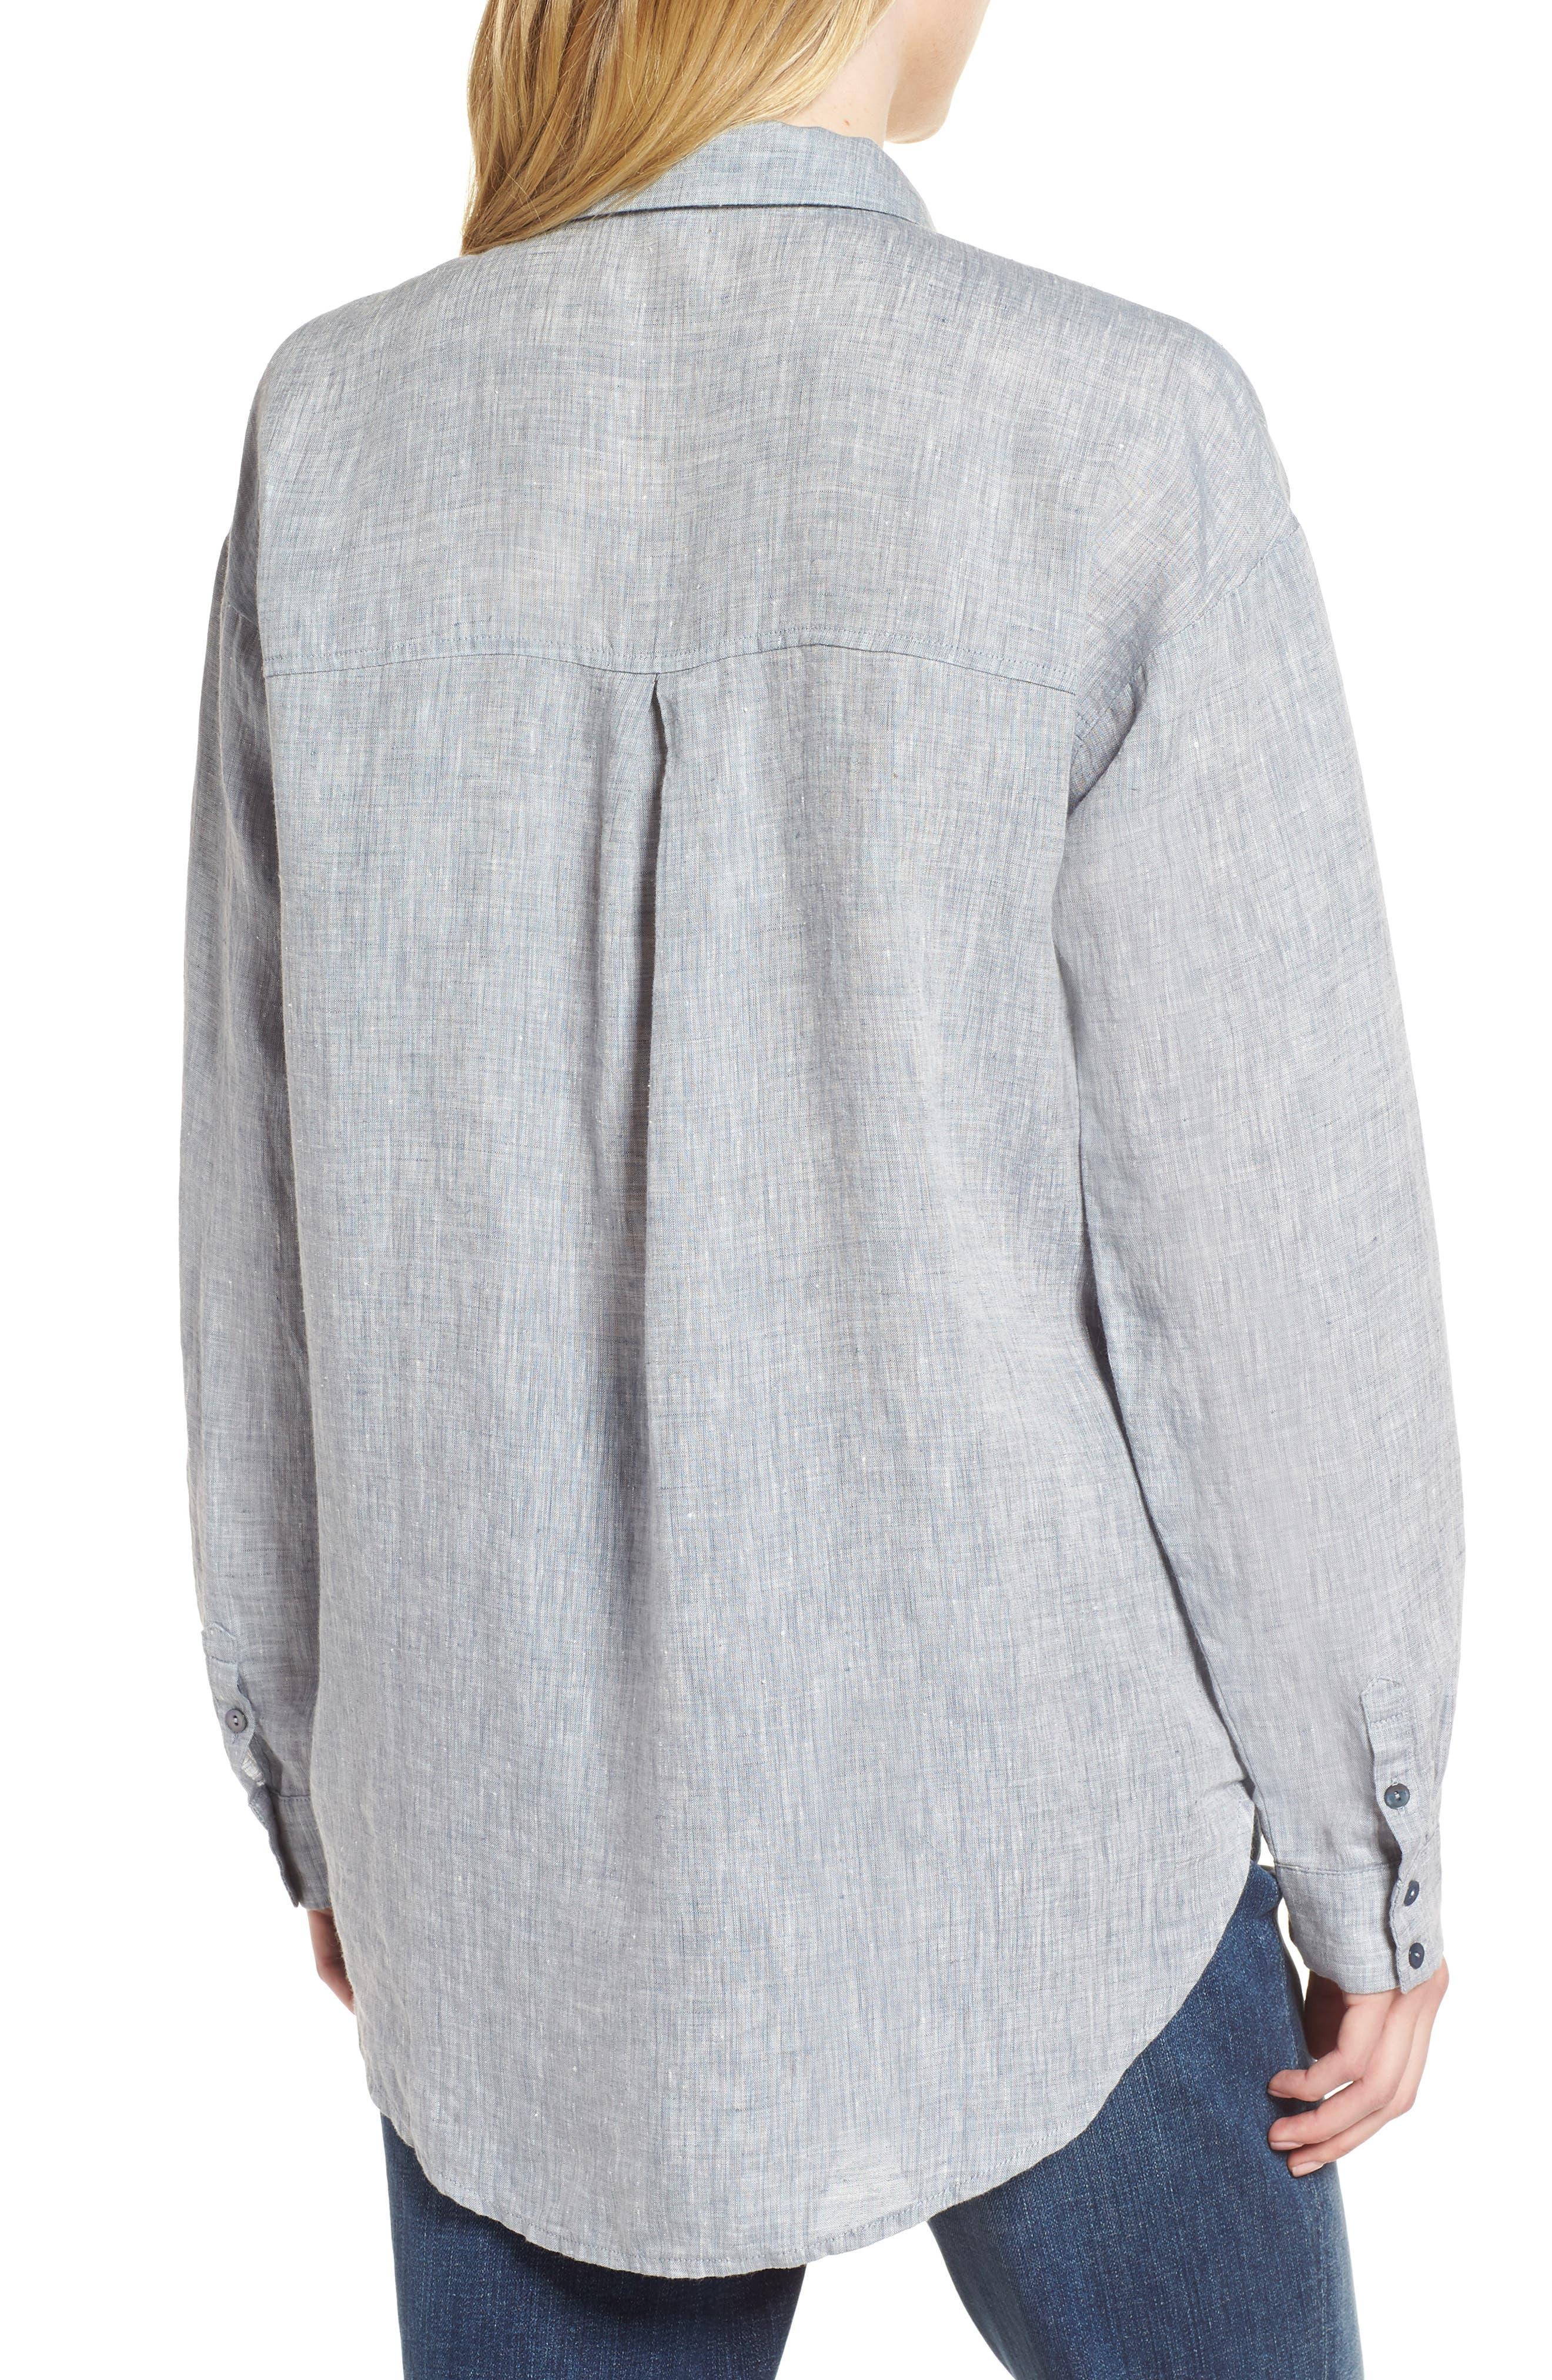 Organic Linen Shirt,                             Alternate thumbnail 4, color,